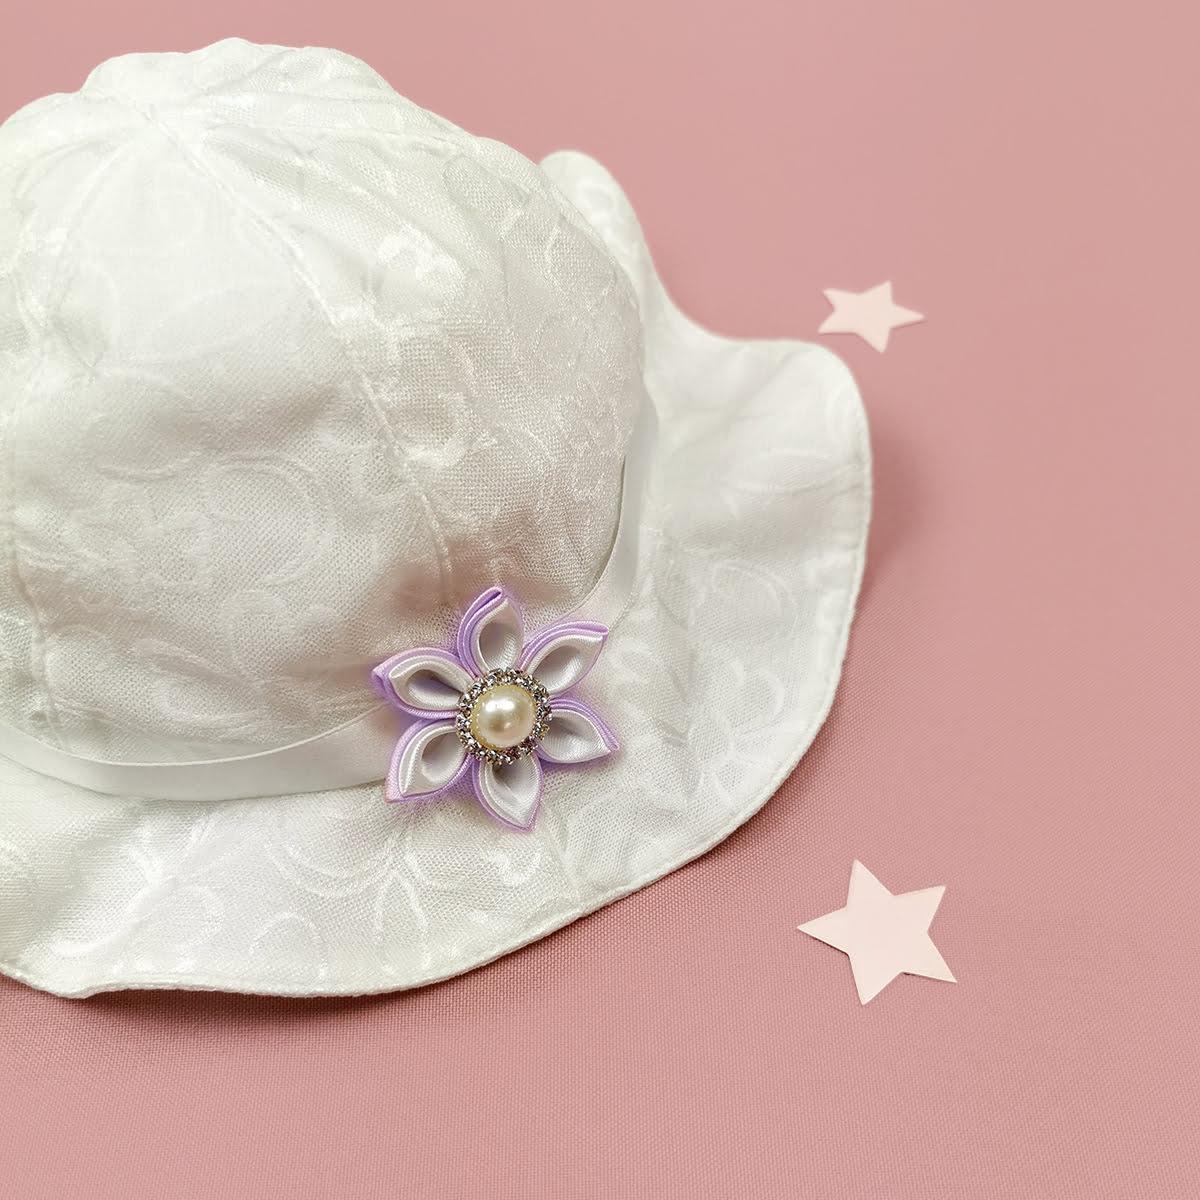 šeširić Morning rose kompletića za krštenje lila